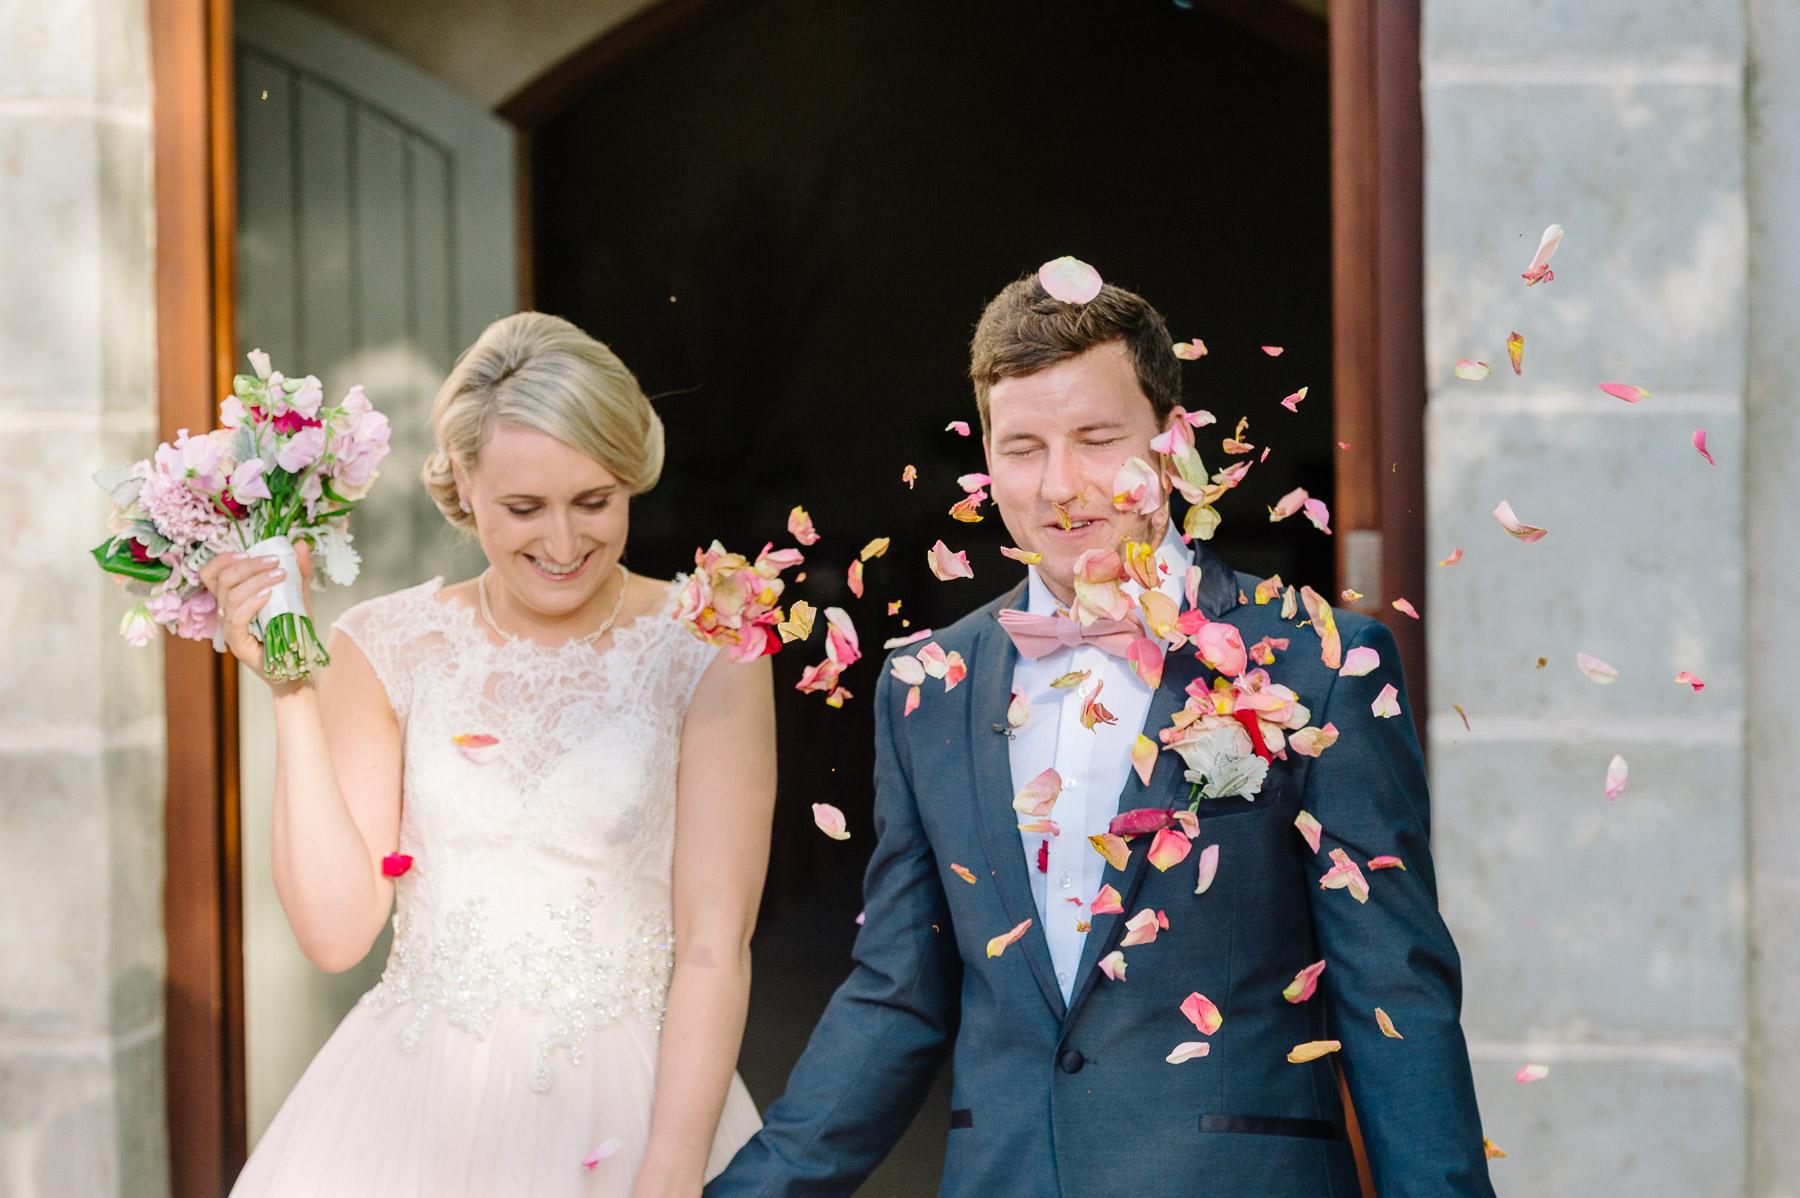 Marnie_and_Charlie_Yarra_Valley_Wedding_Blog-59.jpg